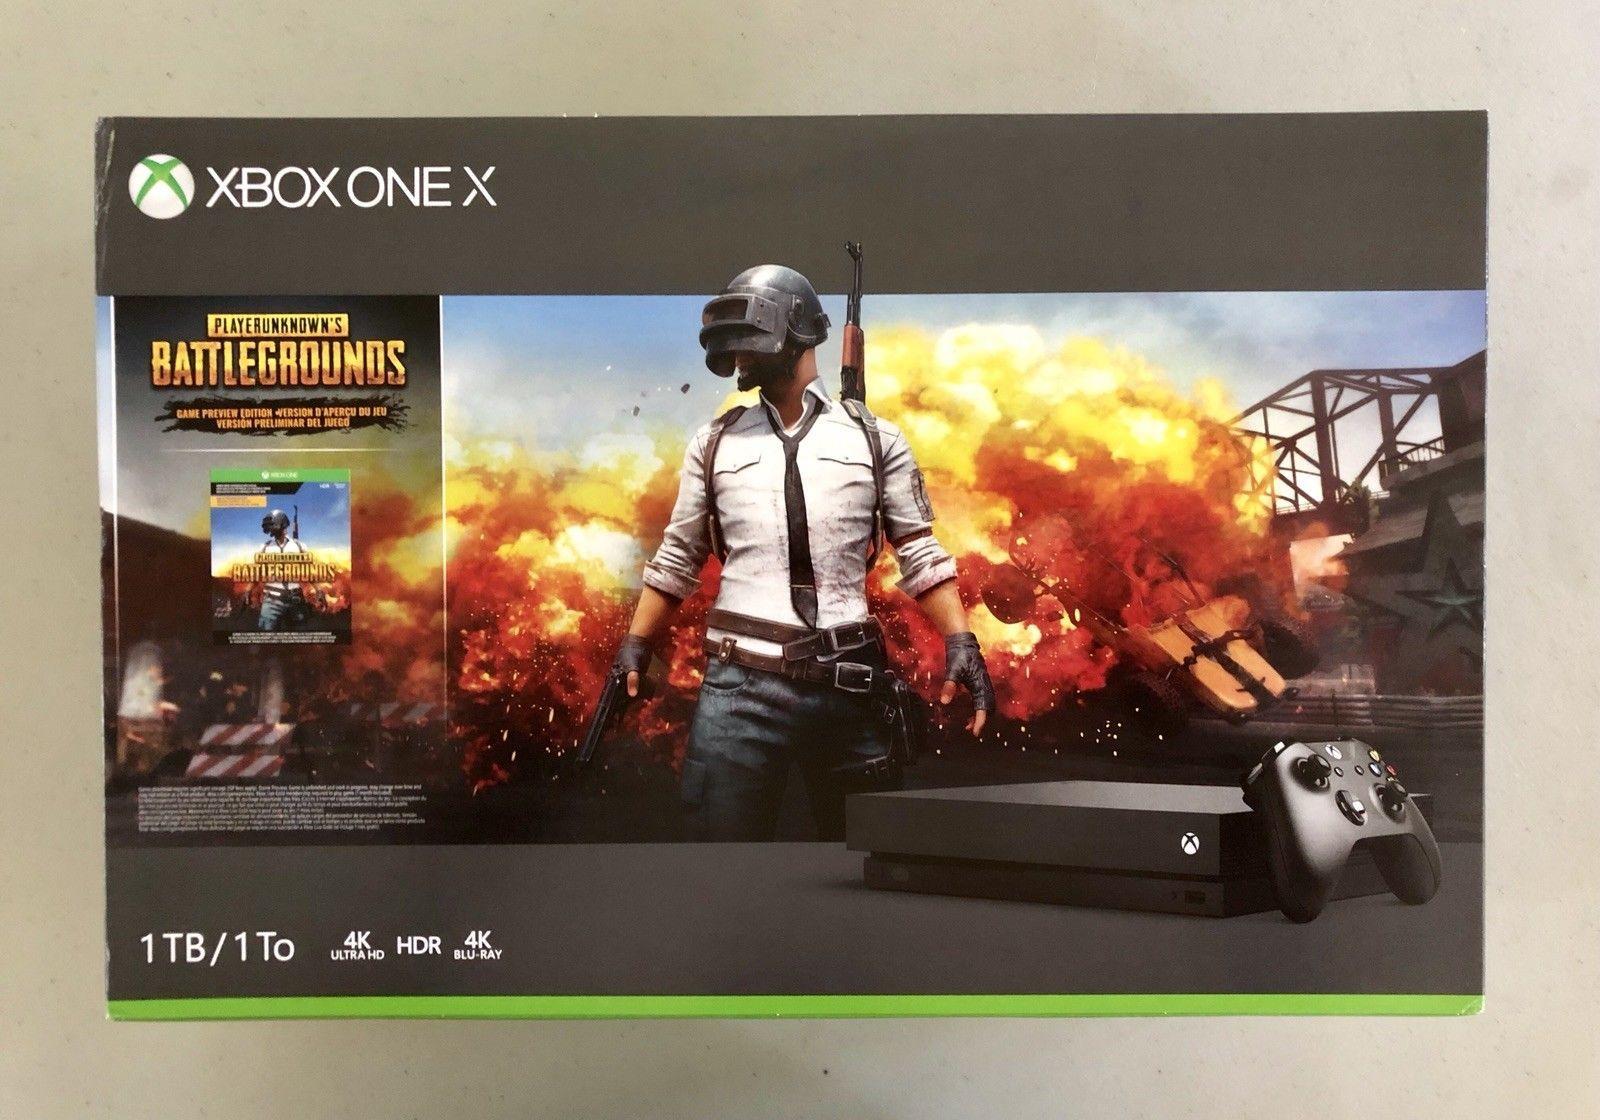 Microsoft Xbox One X 1TB Player Unknown Battlegrounds